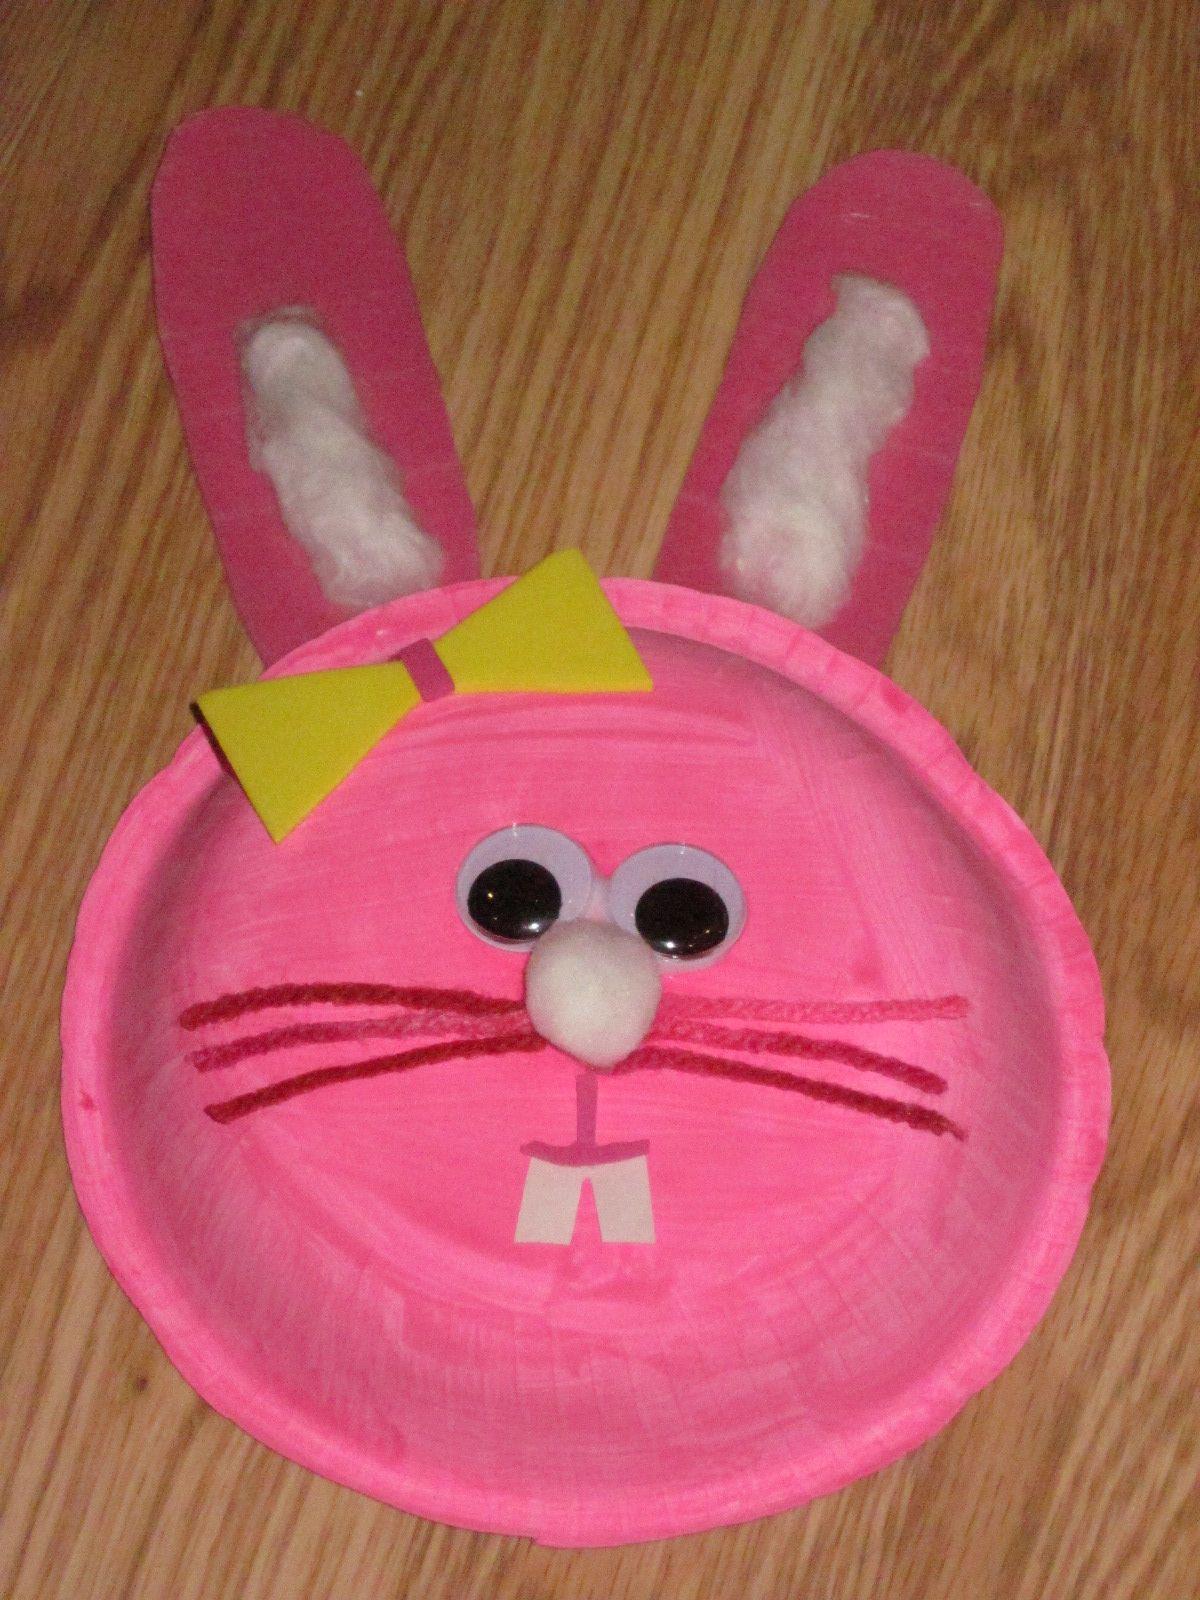 Gummy Lump Toys Blog Sweet Bunny Rabbit Kids Craft Easter Amp Spring Crafts For Kids Project 65